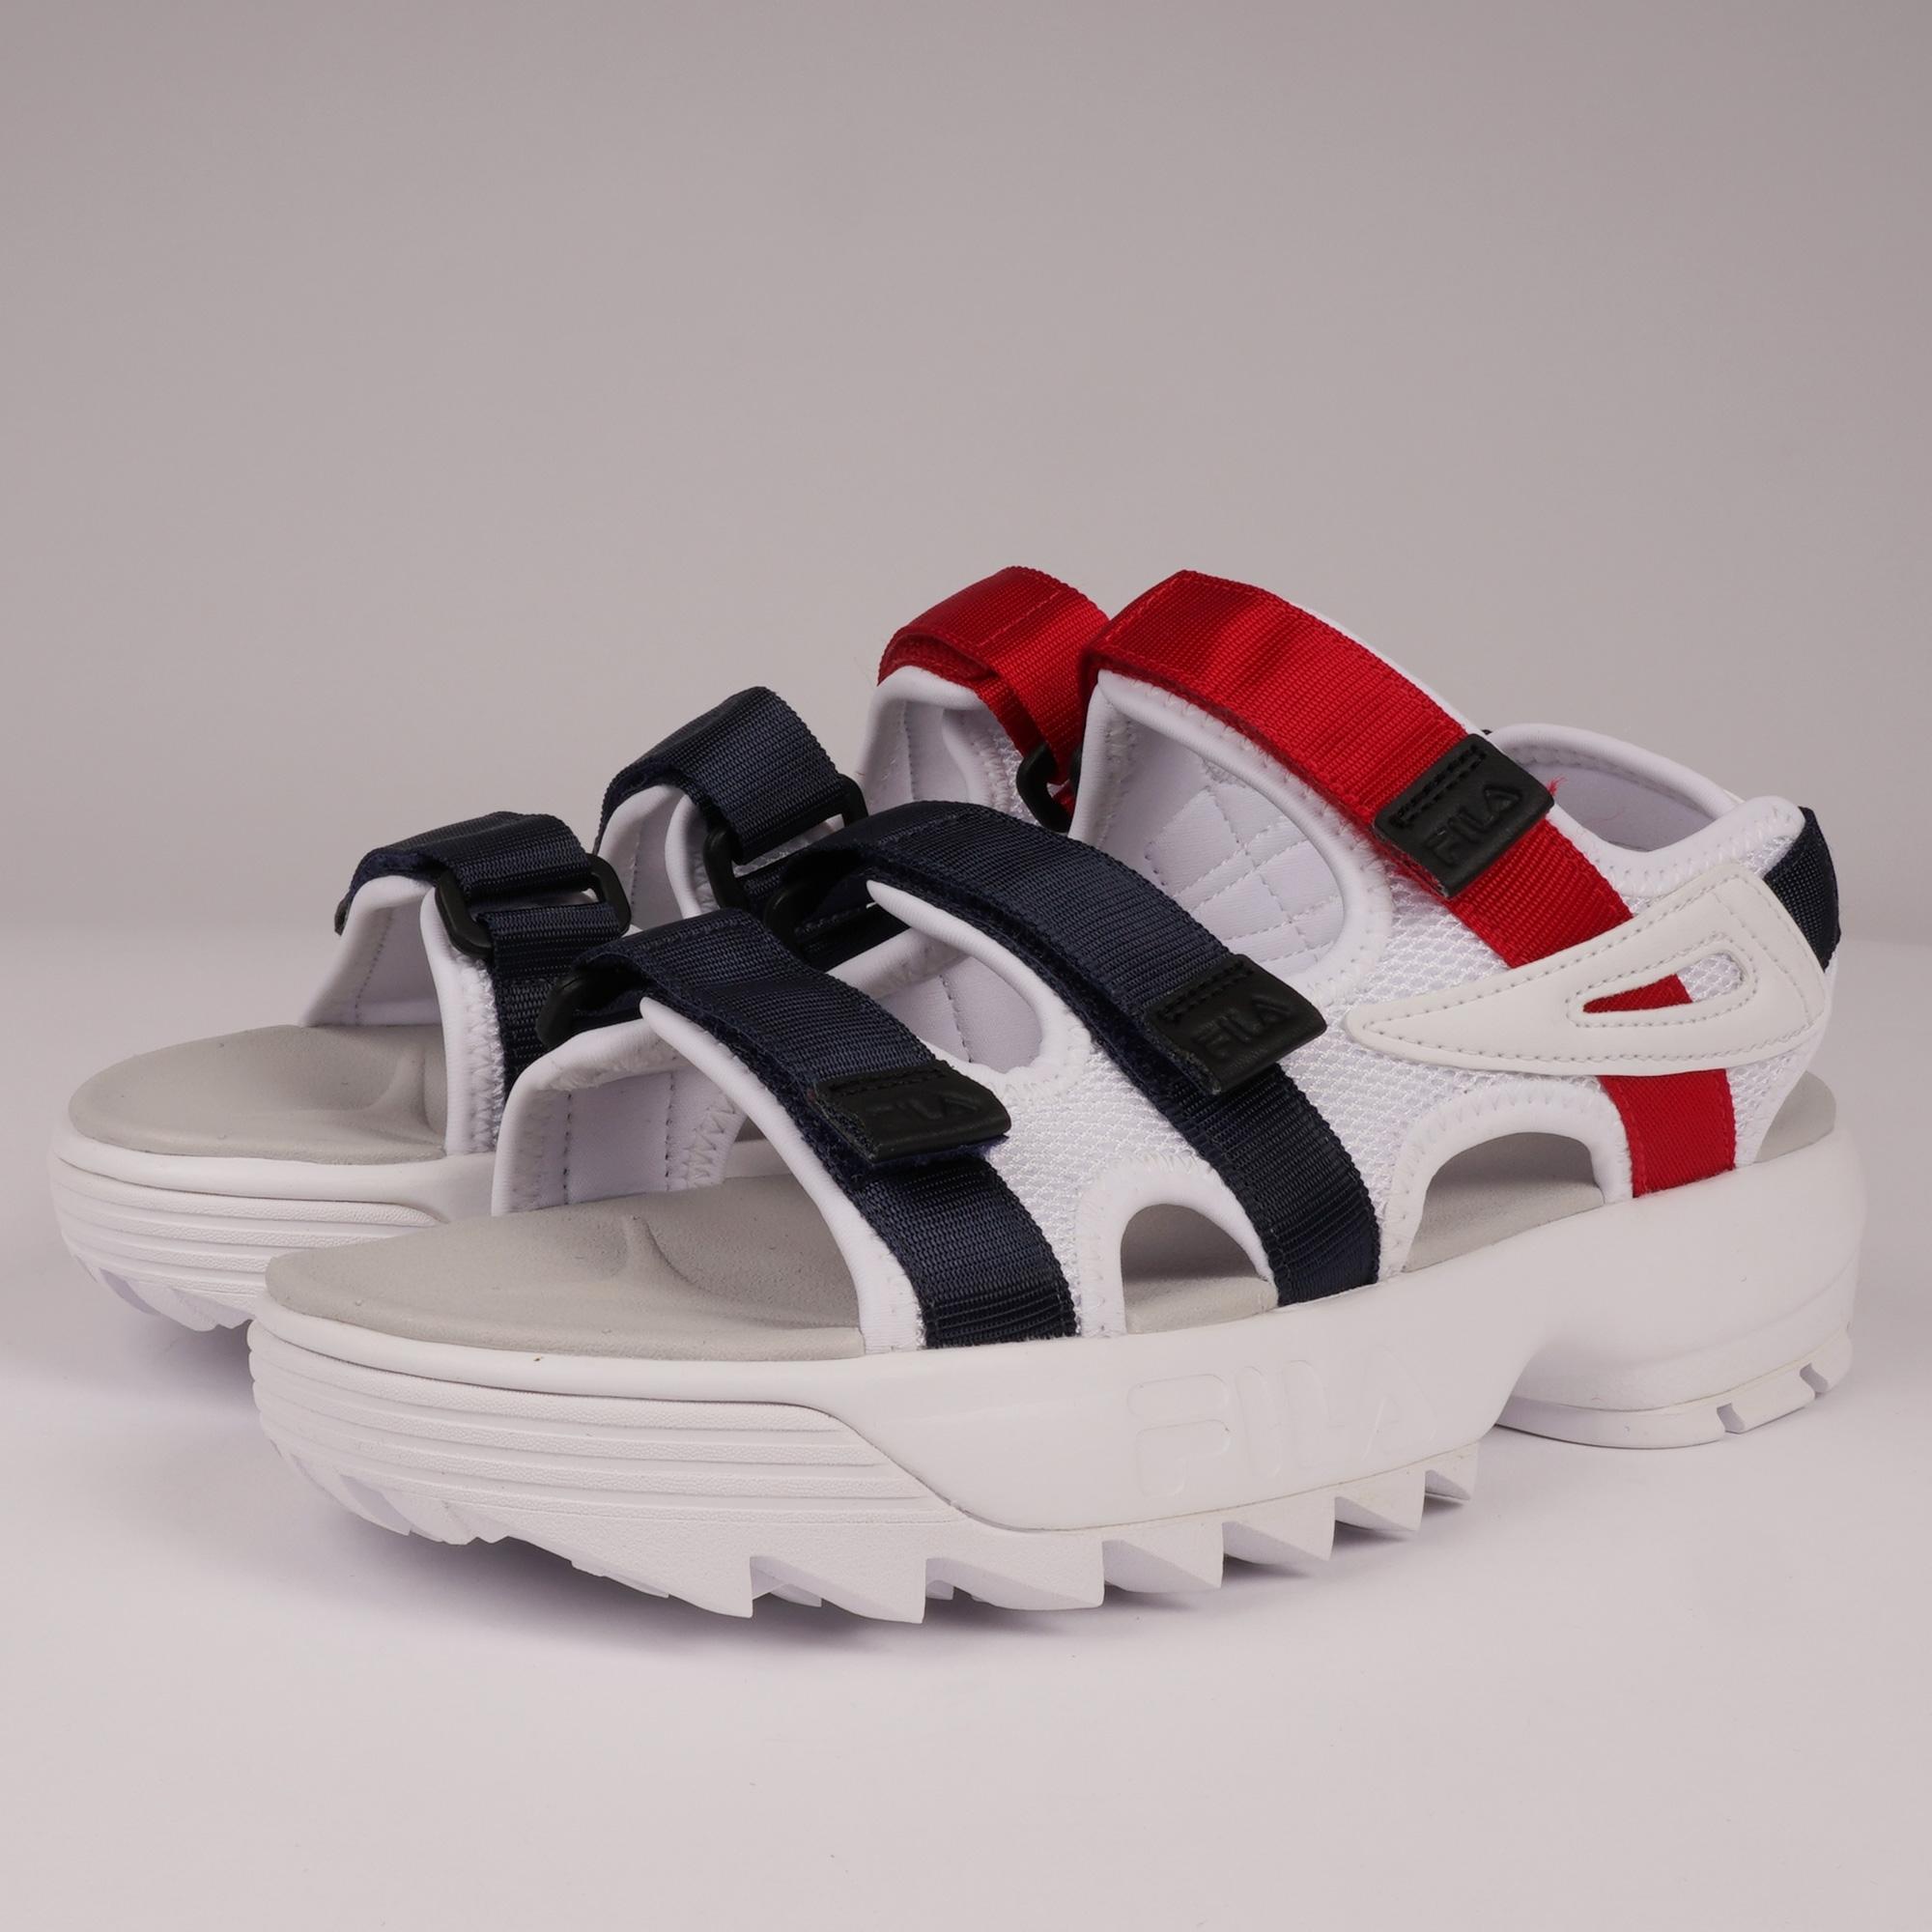 white red women sandals